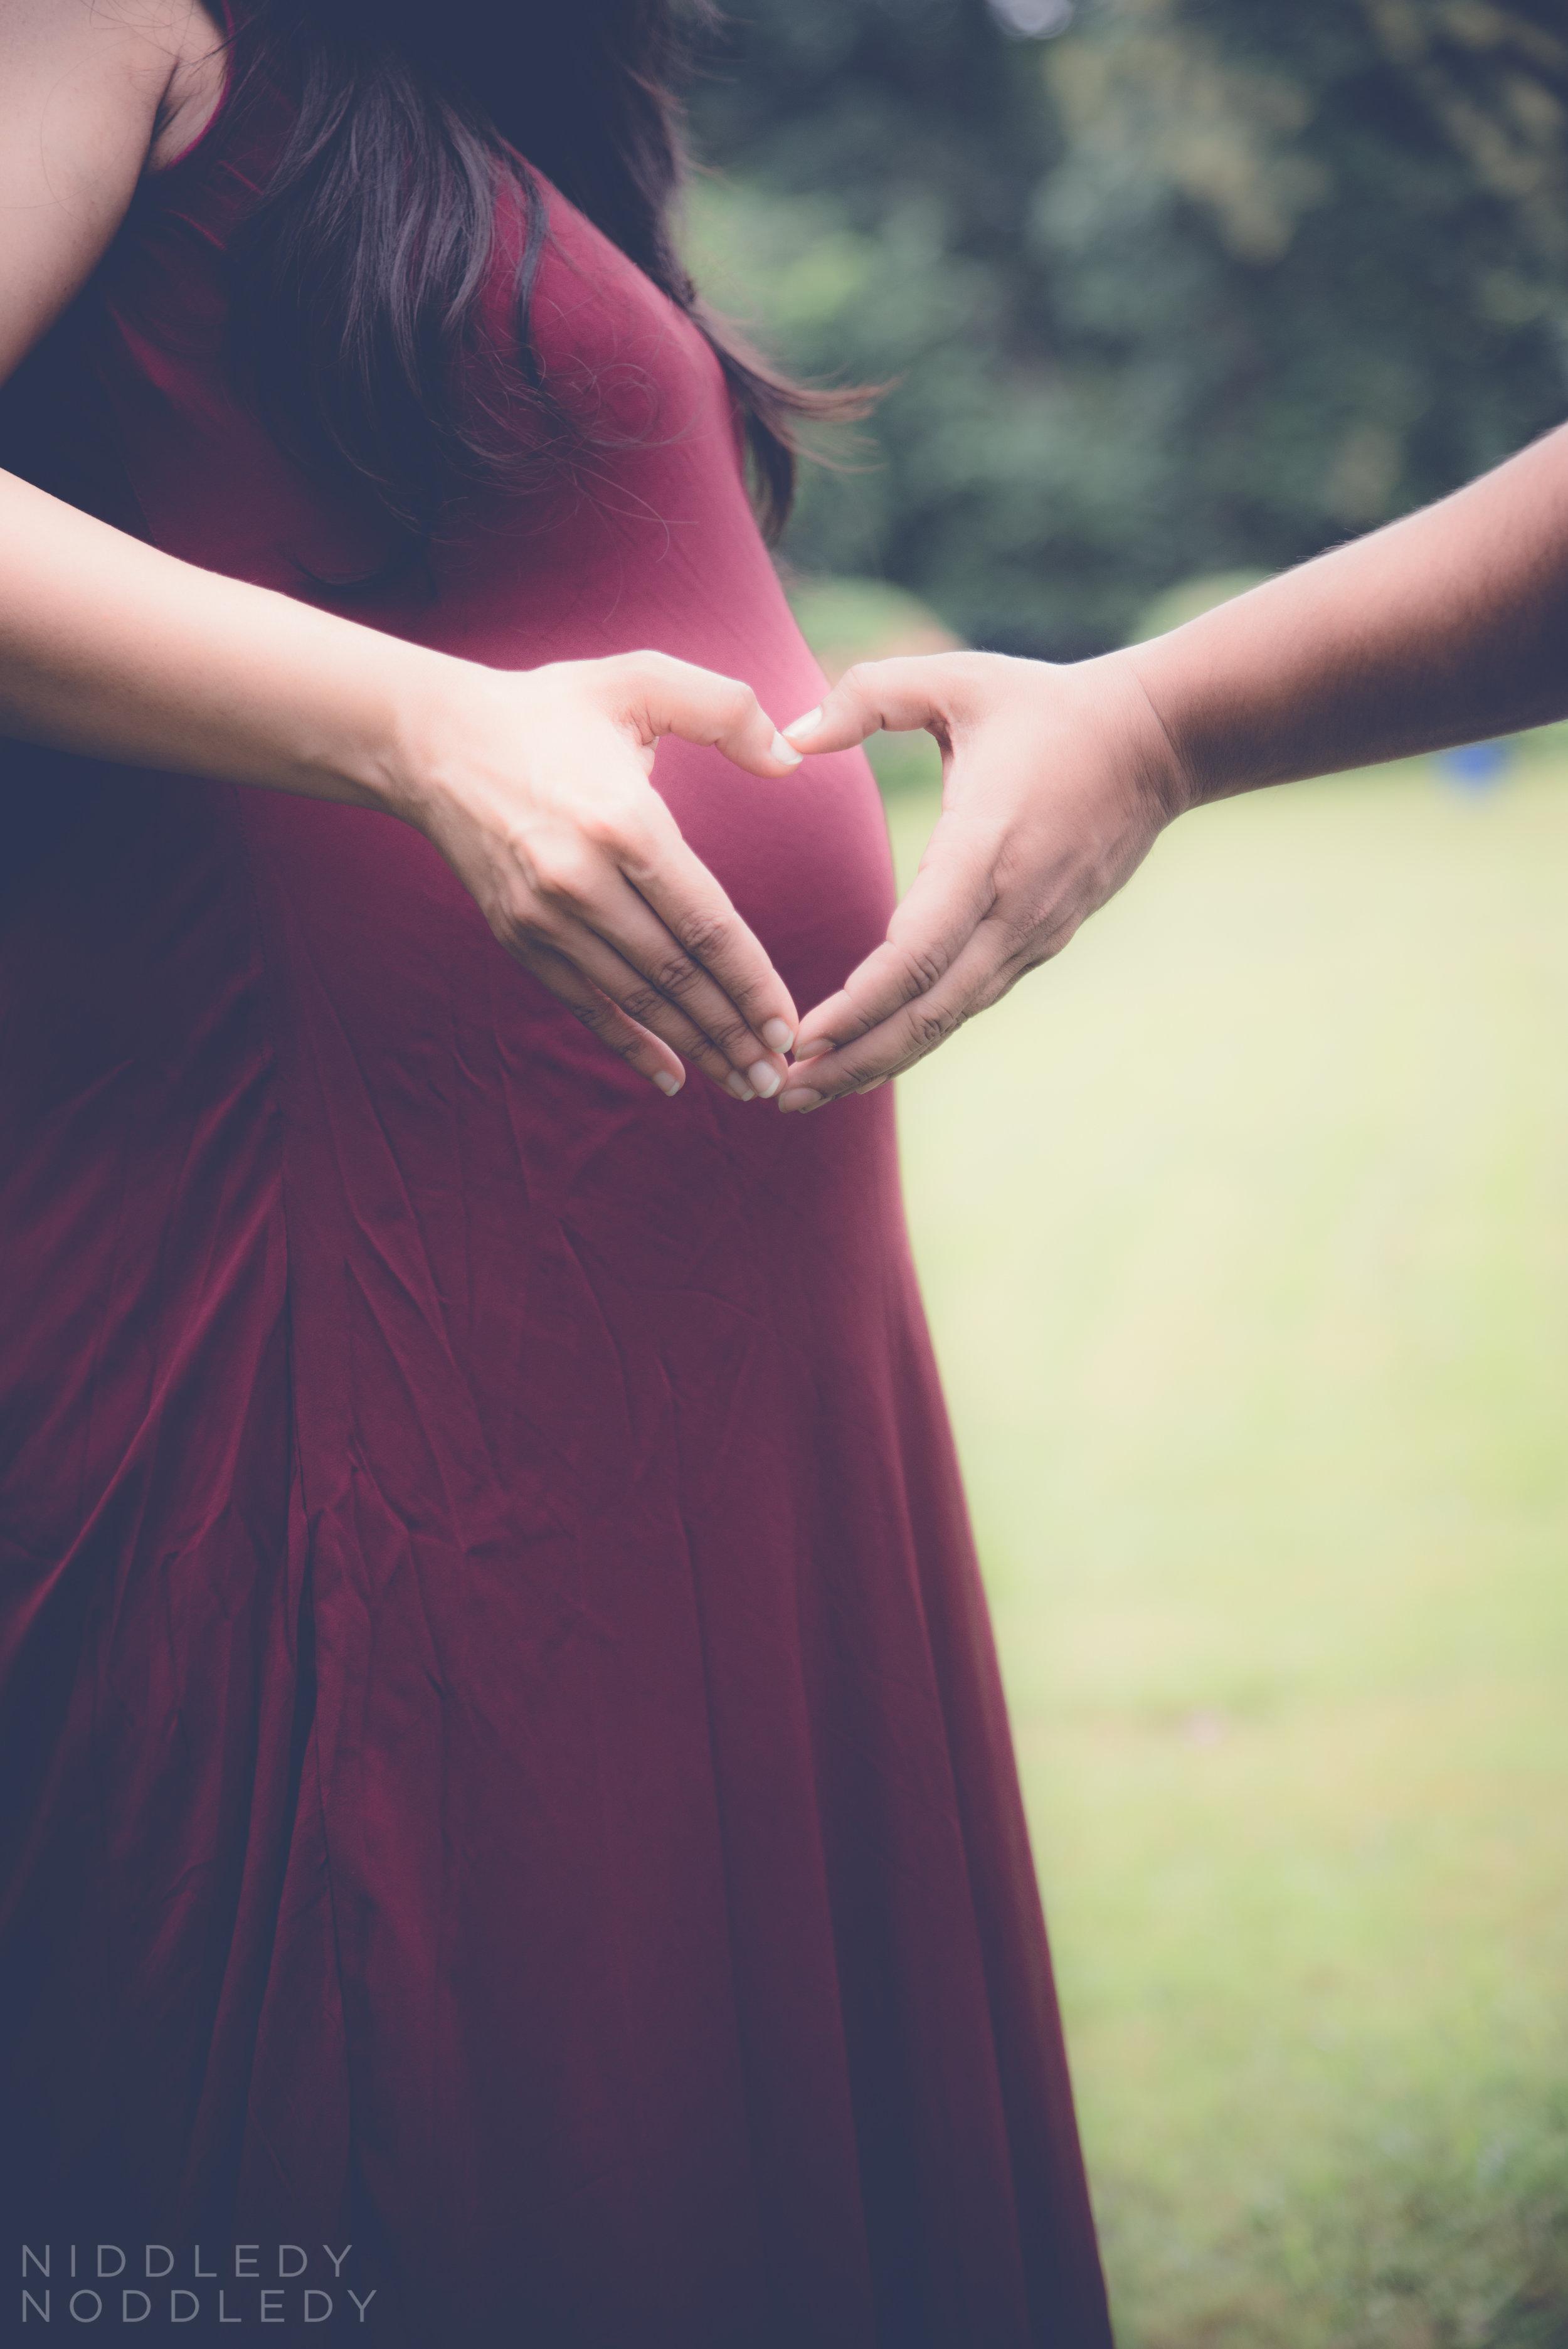 Nidhi Maternity Photoshoot ❤ NiddledyNoddledy.com ~ Bumps to Babies Photography, Kolkata - 02.jpg